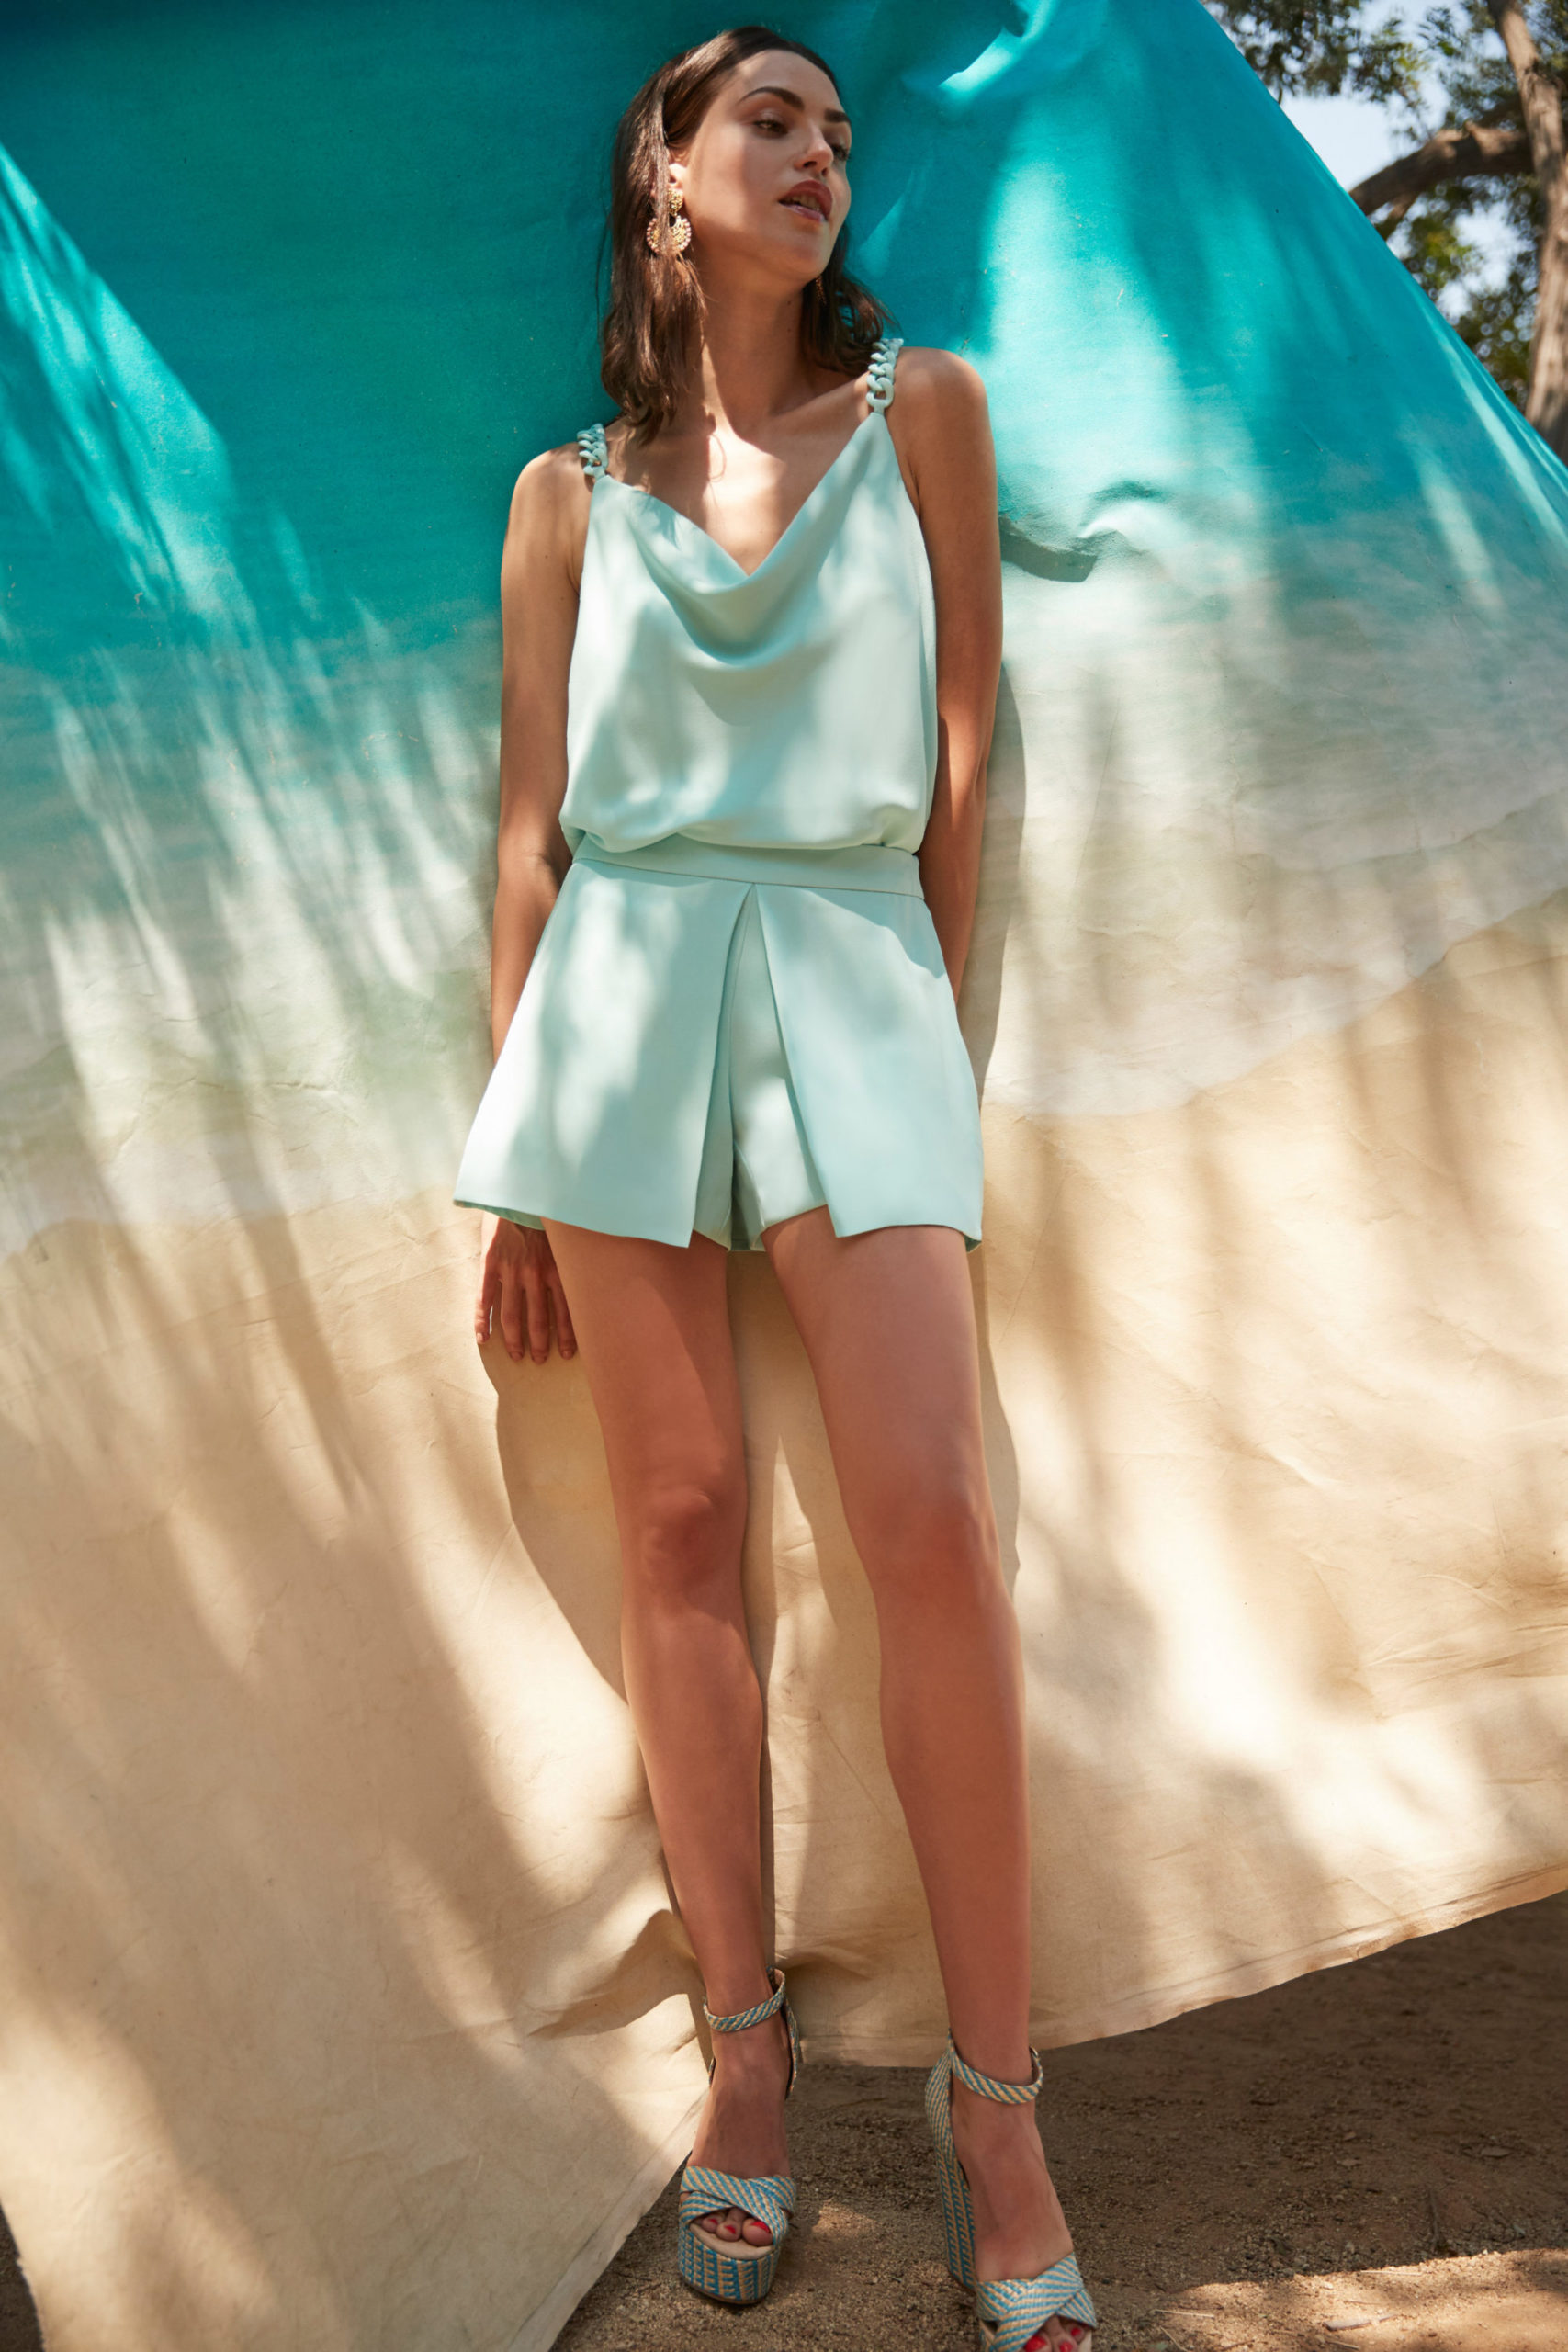 Ментоловый образ от Trina Turk Ready To Wear весна-лето 2021